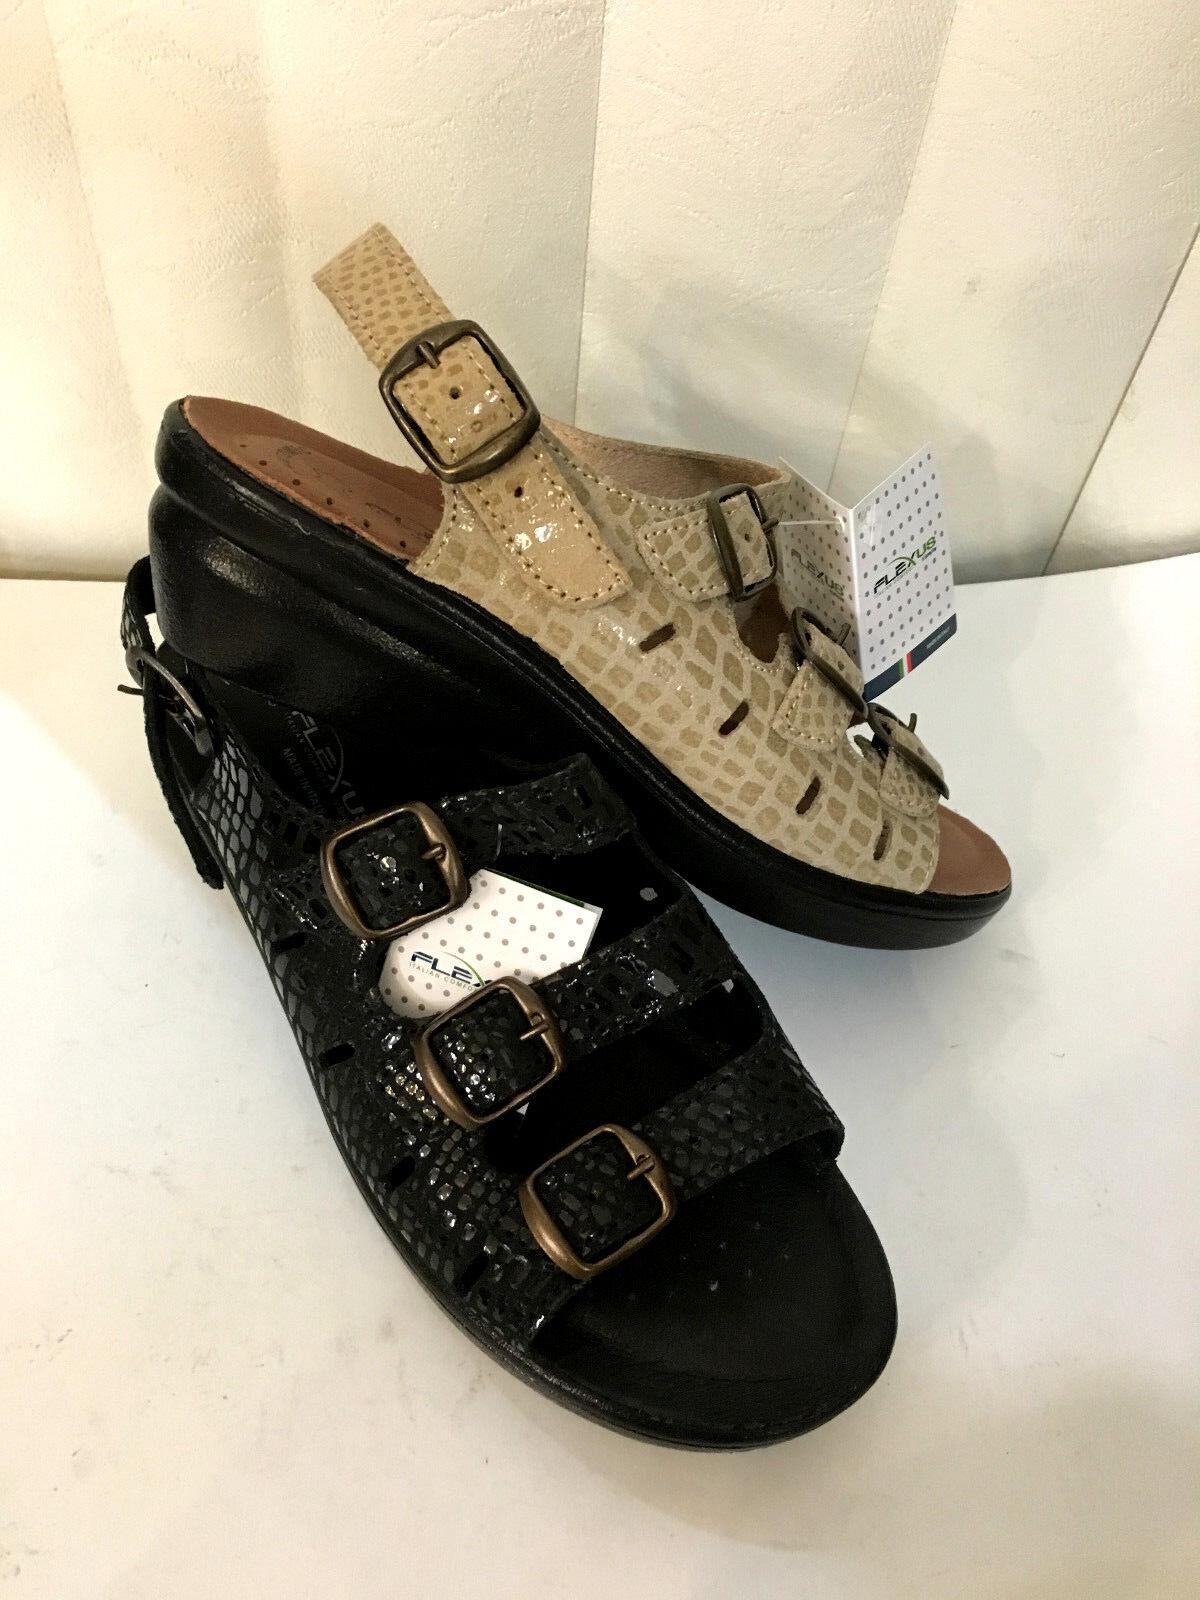 Flexus Adriana nero  Beige Leather Adjustable Sandals Dimensione 5-11 5-11 5-11  MADE IN ITALY  9ace0b